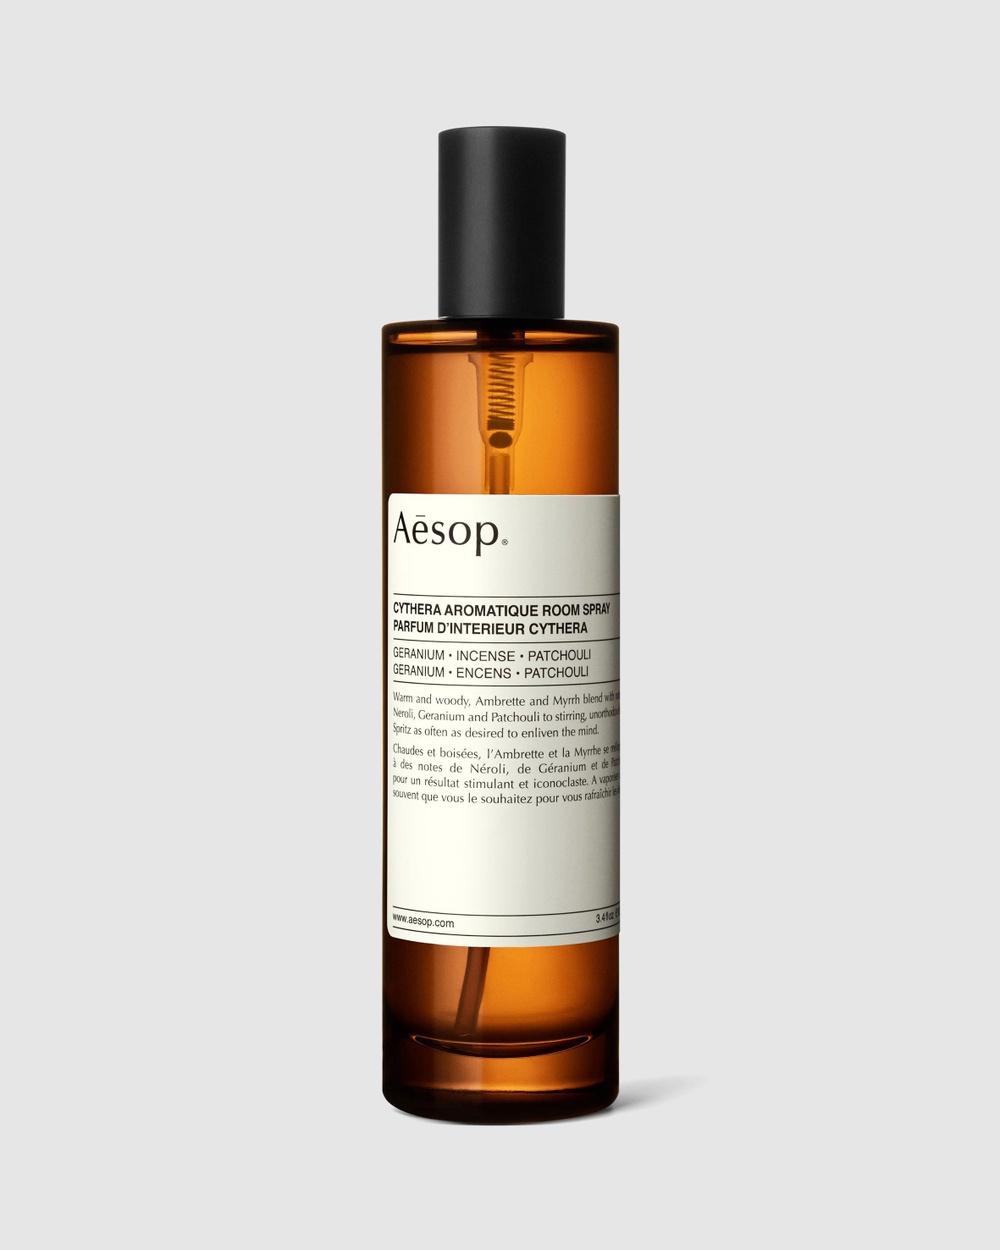 Aesop Cythera Aromatique Room Spray 100mL Home Fragrance N/A